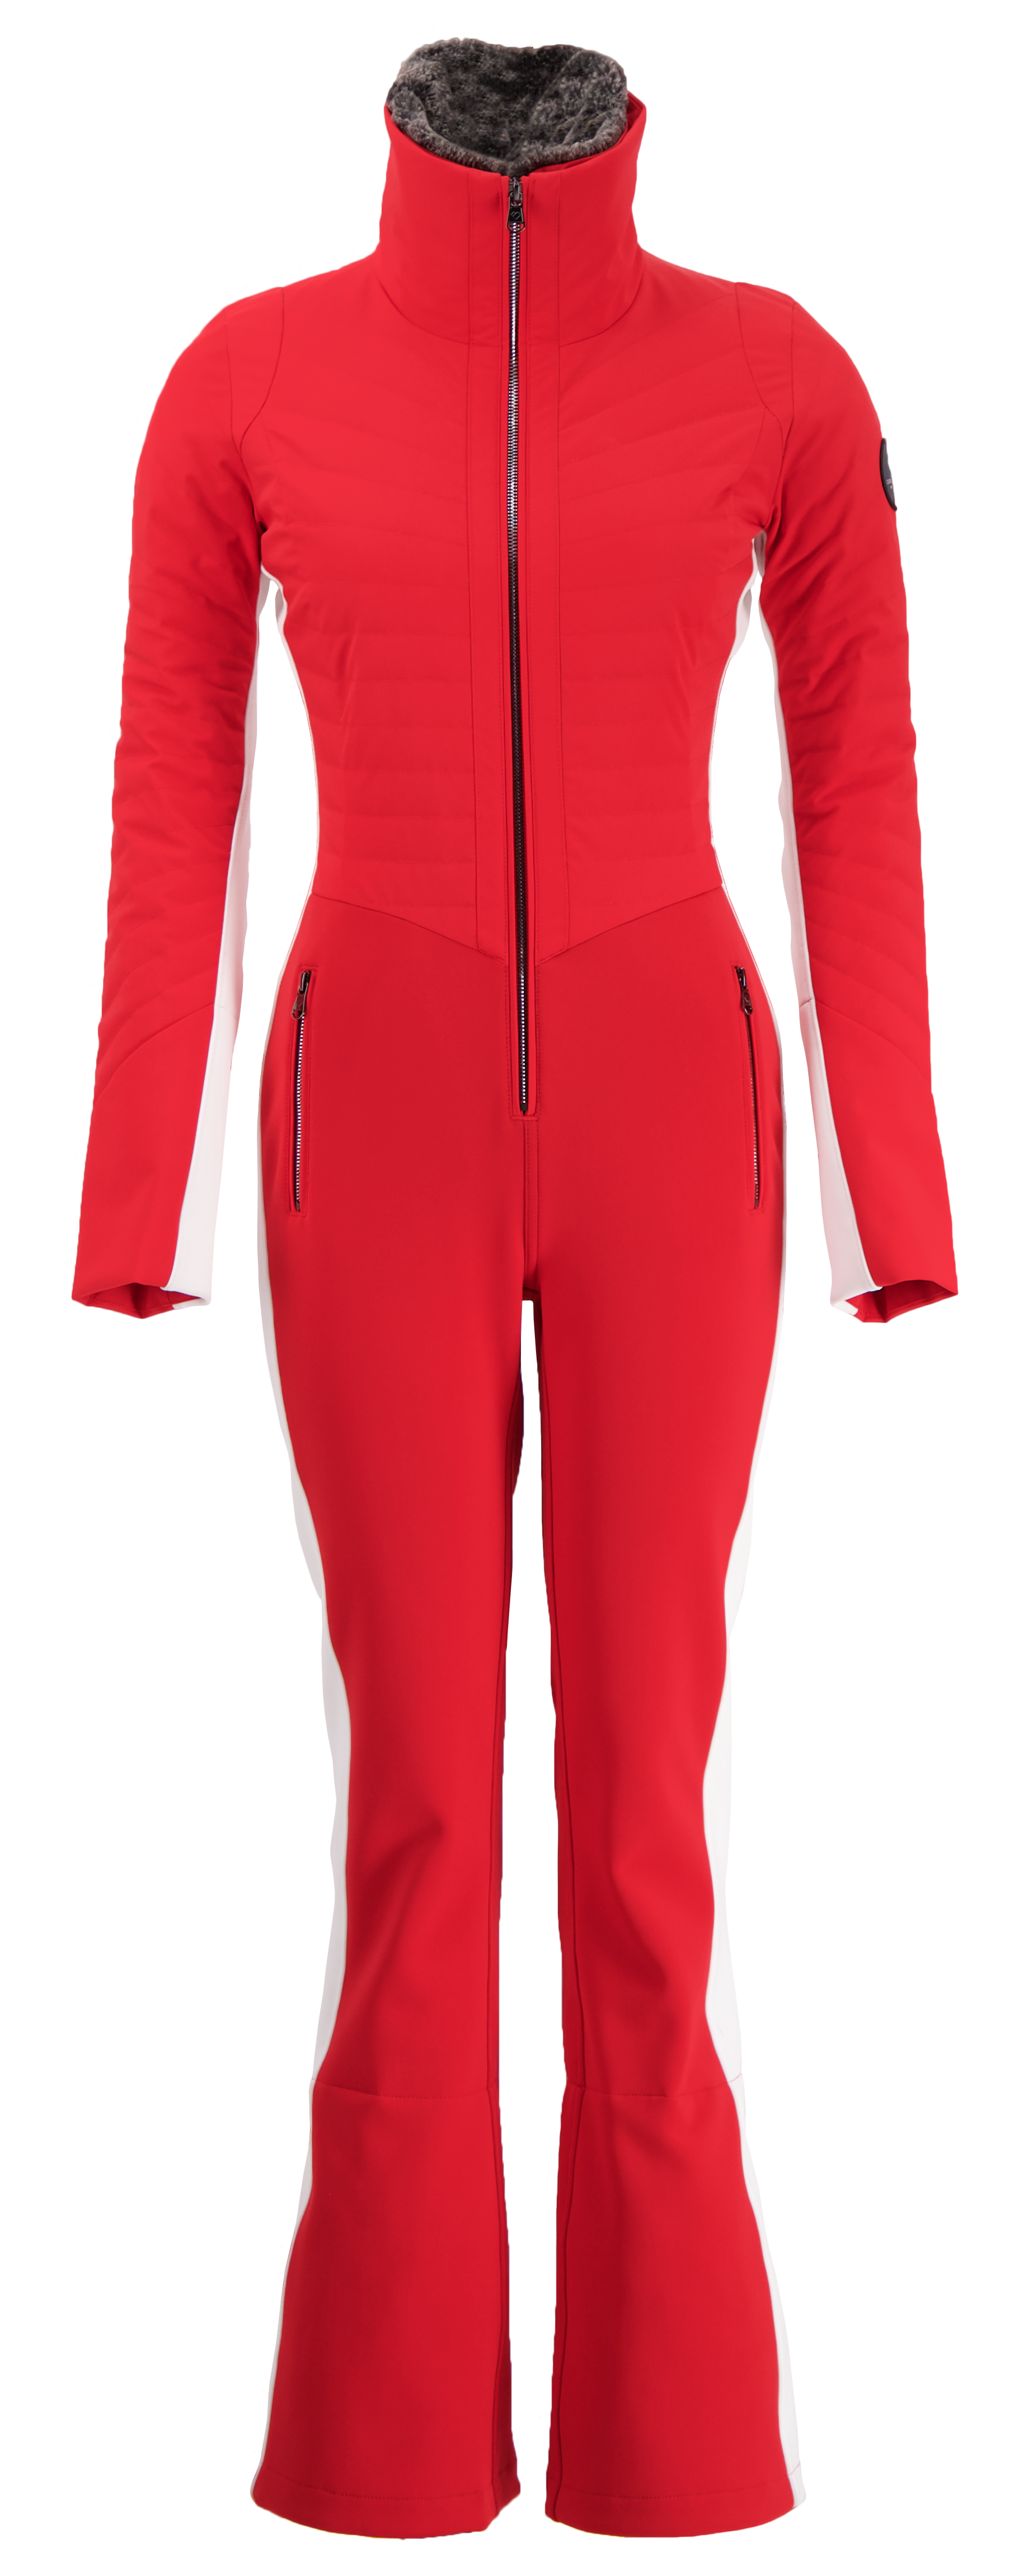 Obermeyer Core Jacket, $219 Rossignol HPA Cockpit Race gloves, $85 Smith Slider sunglasses, $99